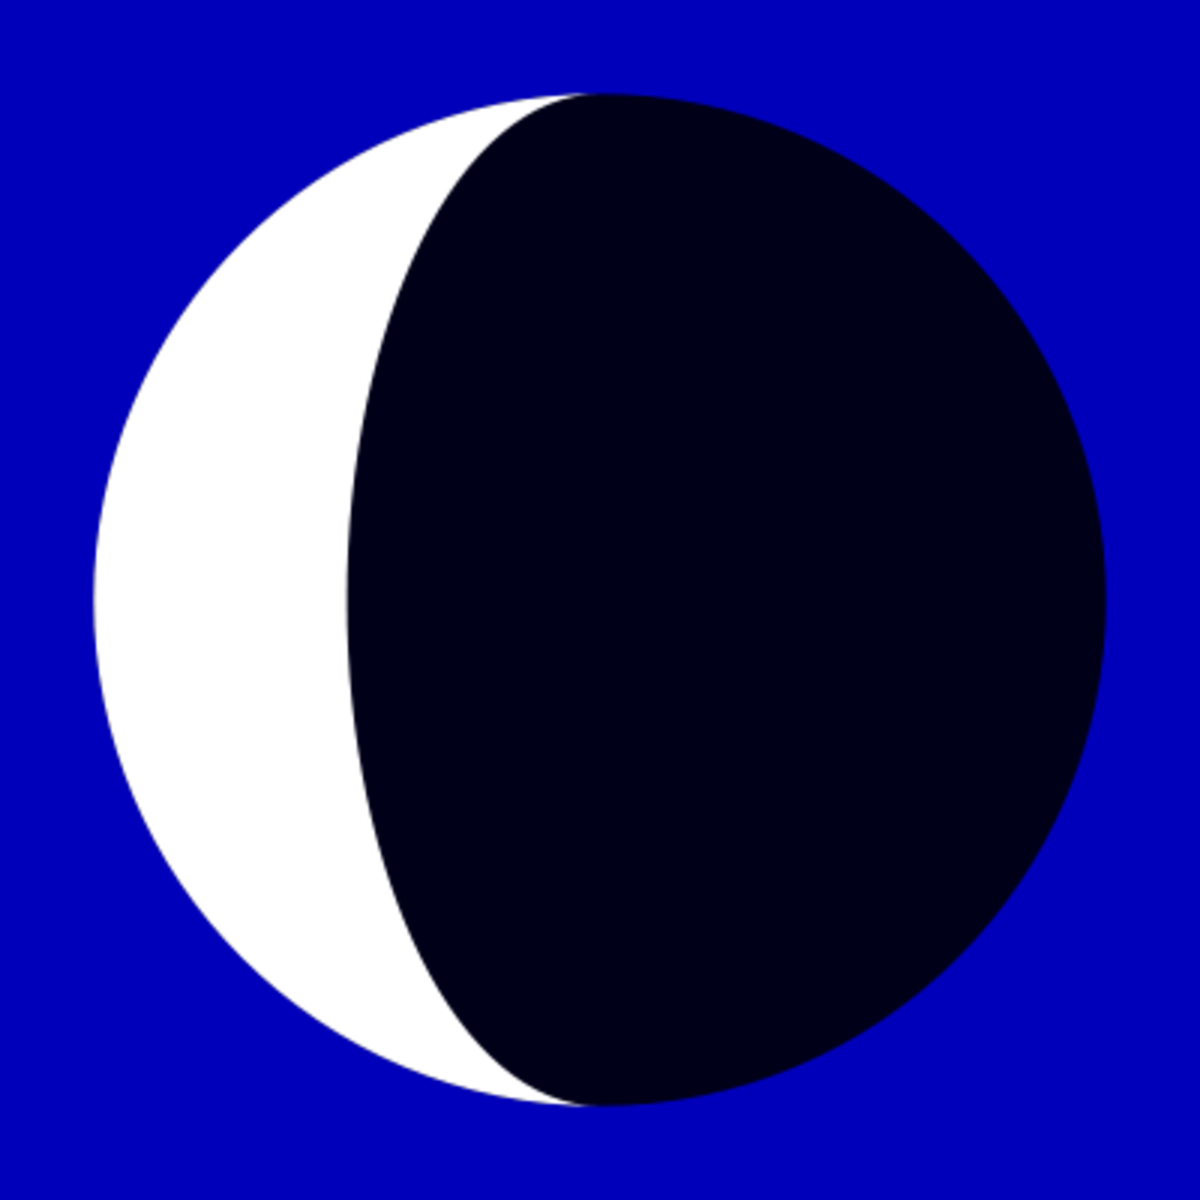 born-under-a-waning-crescent-balsamic-moon